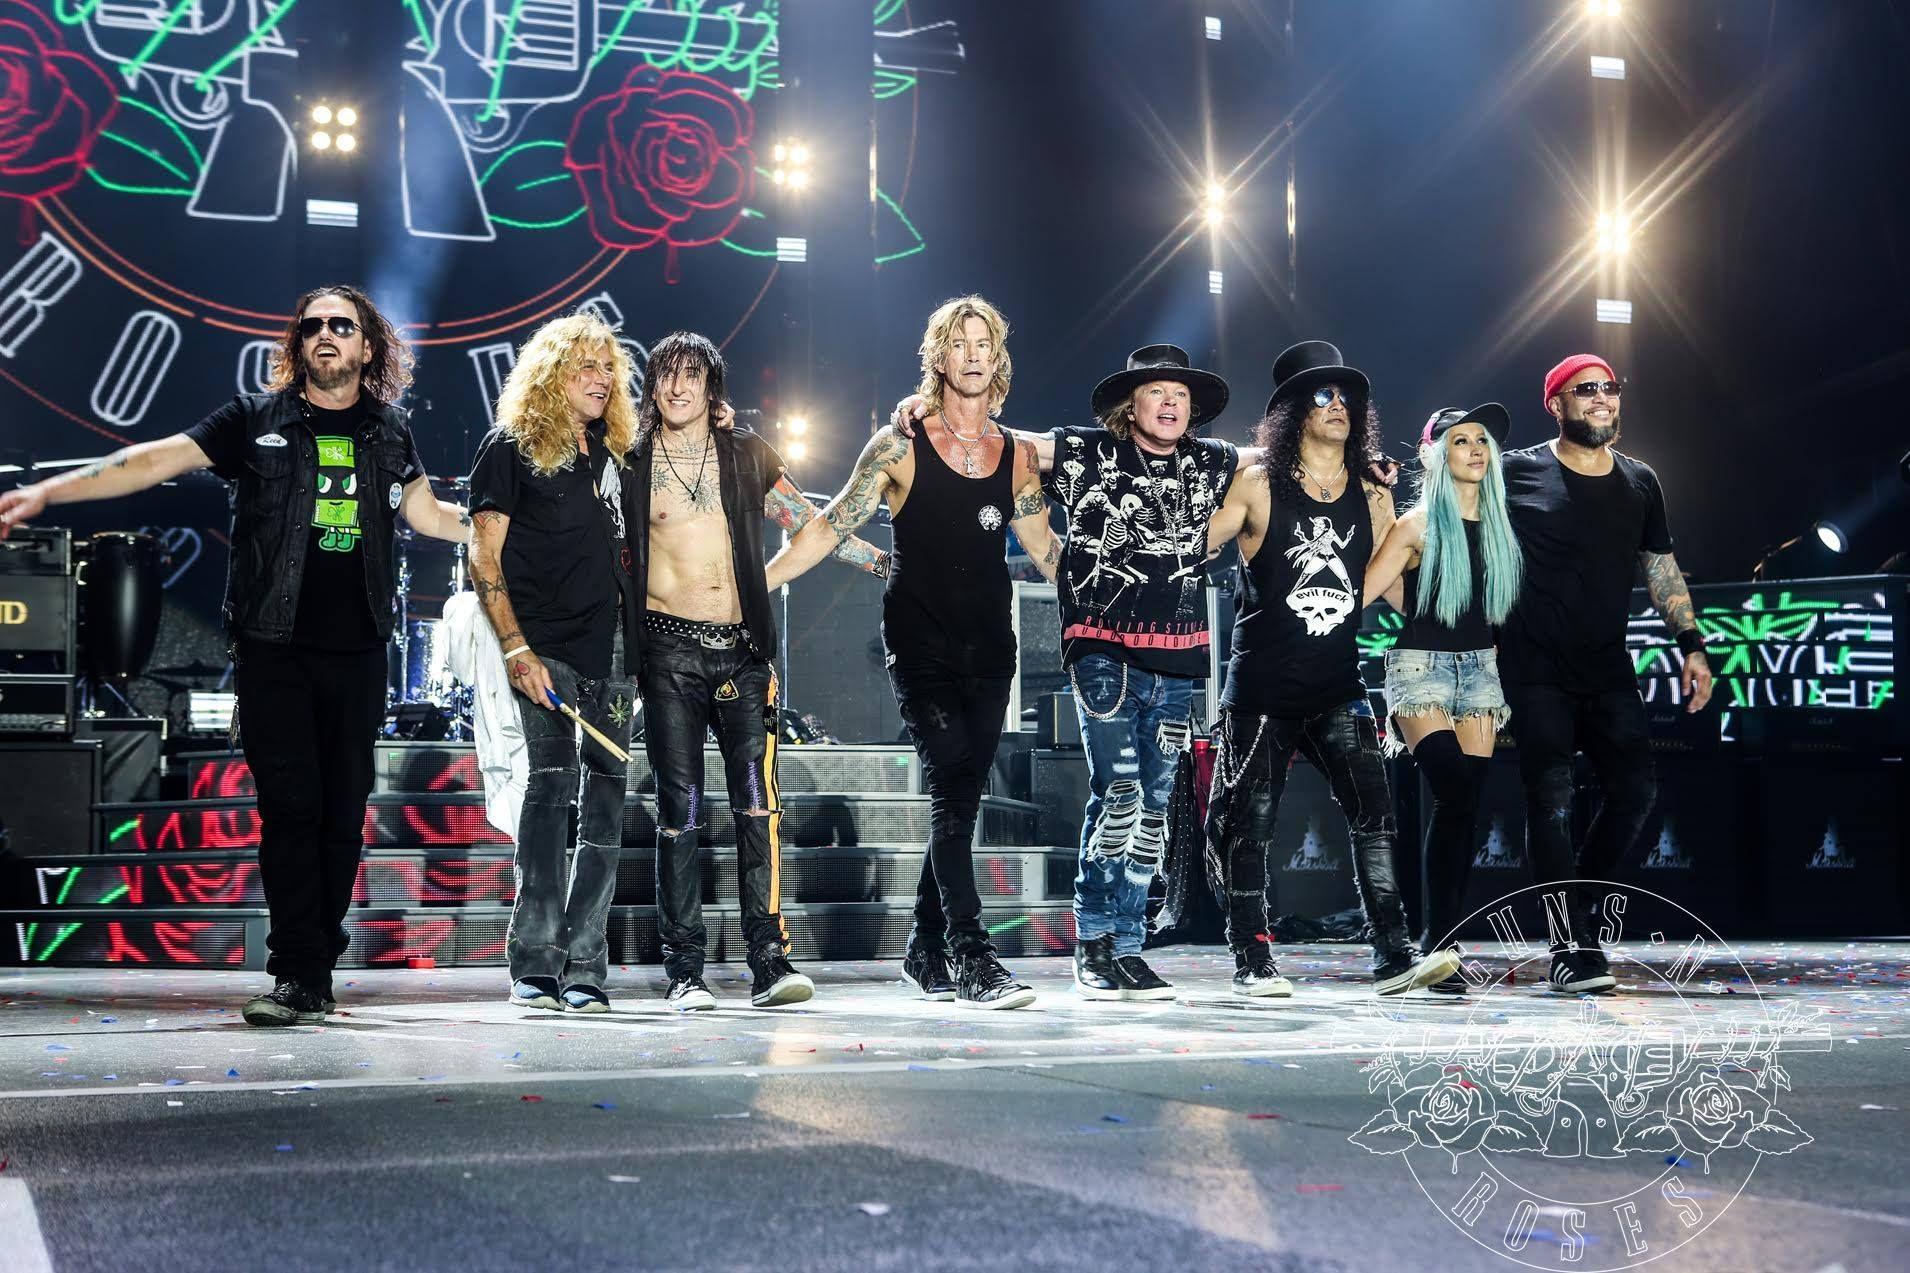 Los Guns N Roses tocarán en Argentina en noviembre